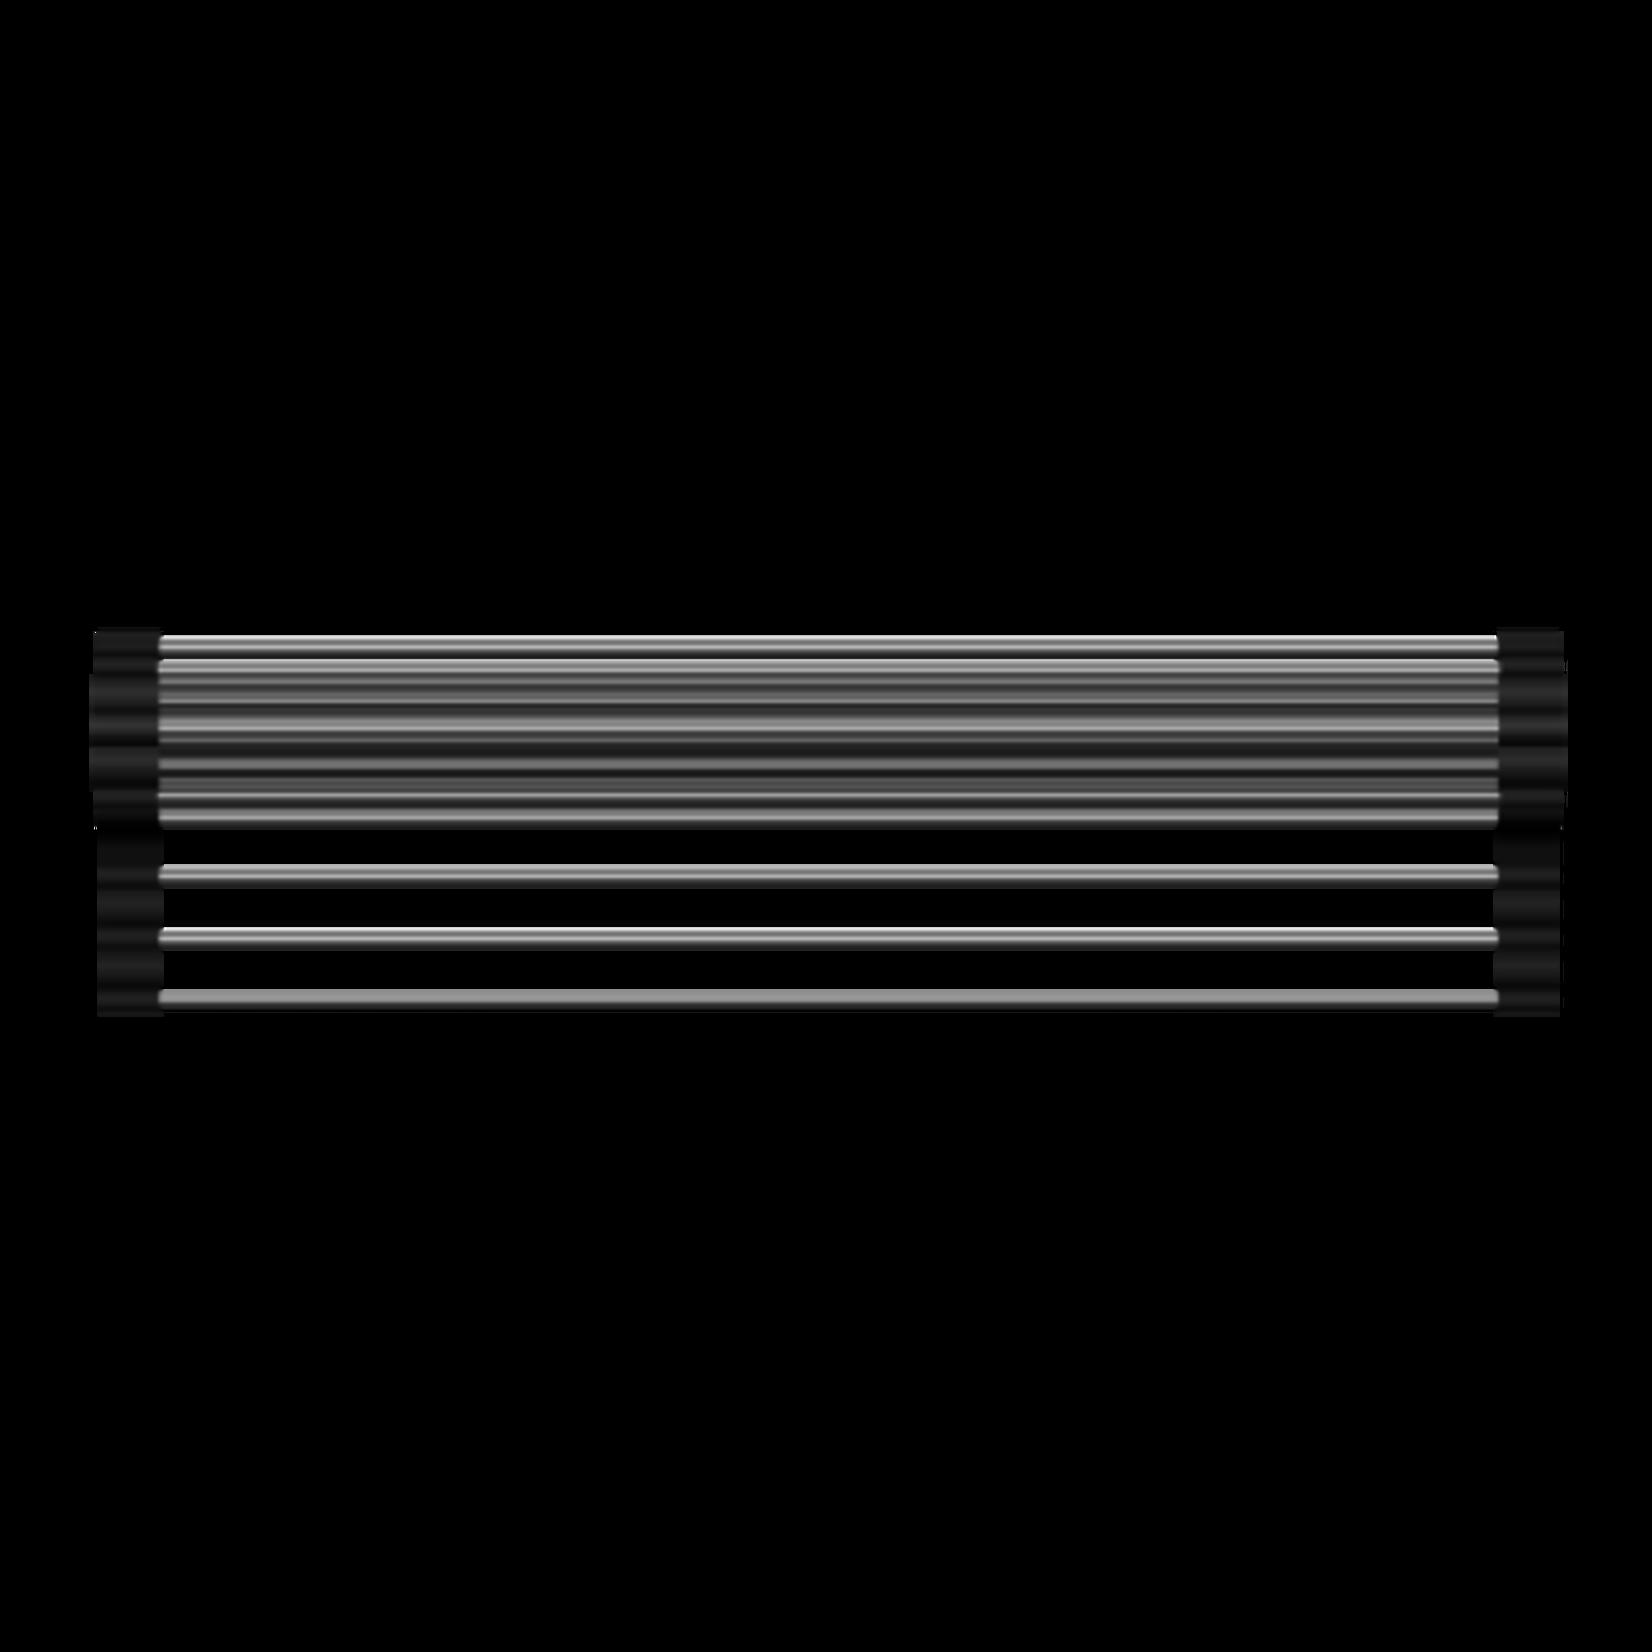 Support à séchage pliable en inox RL001